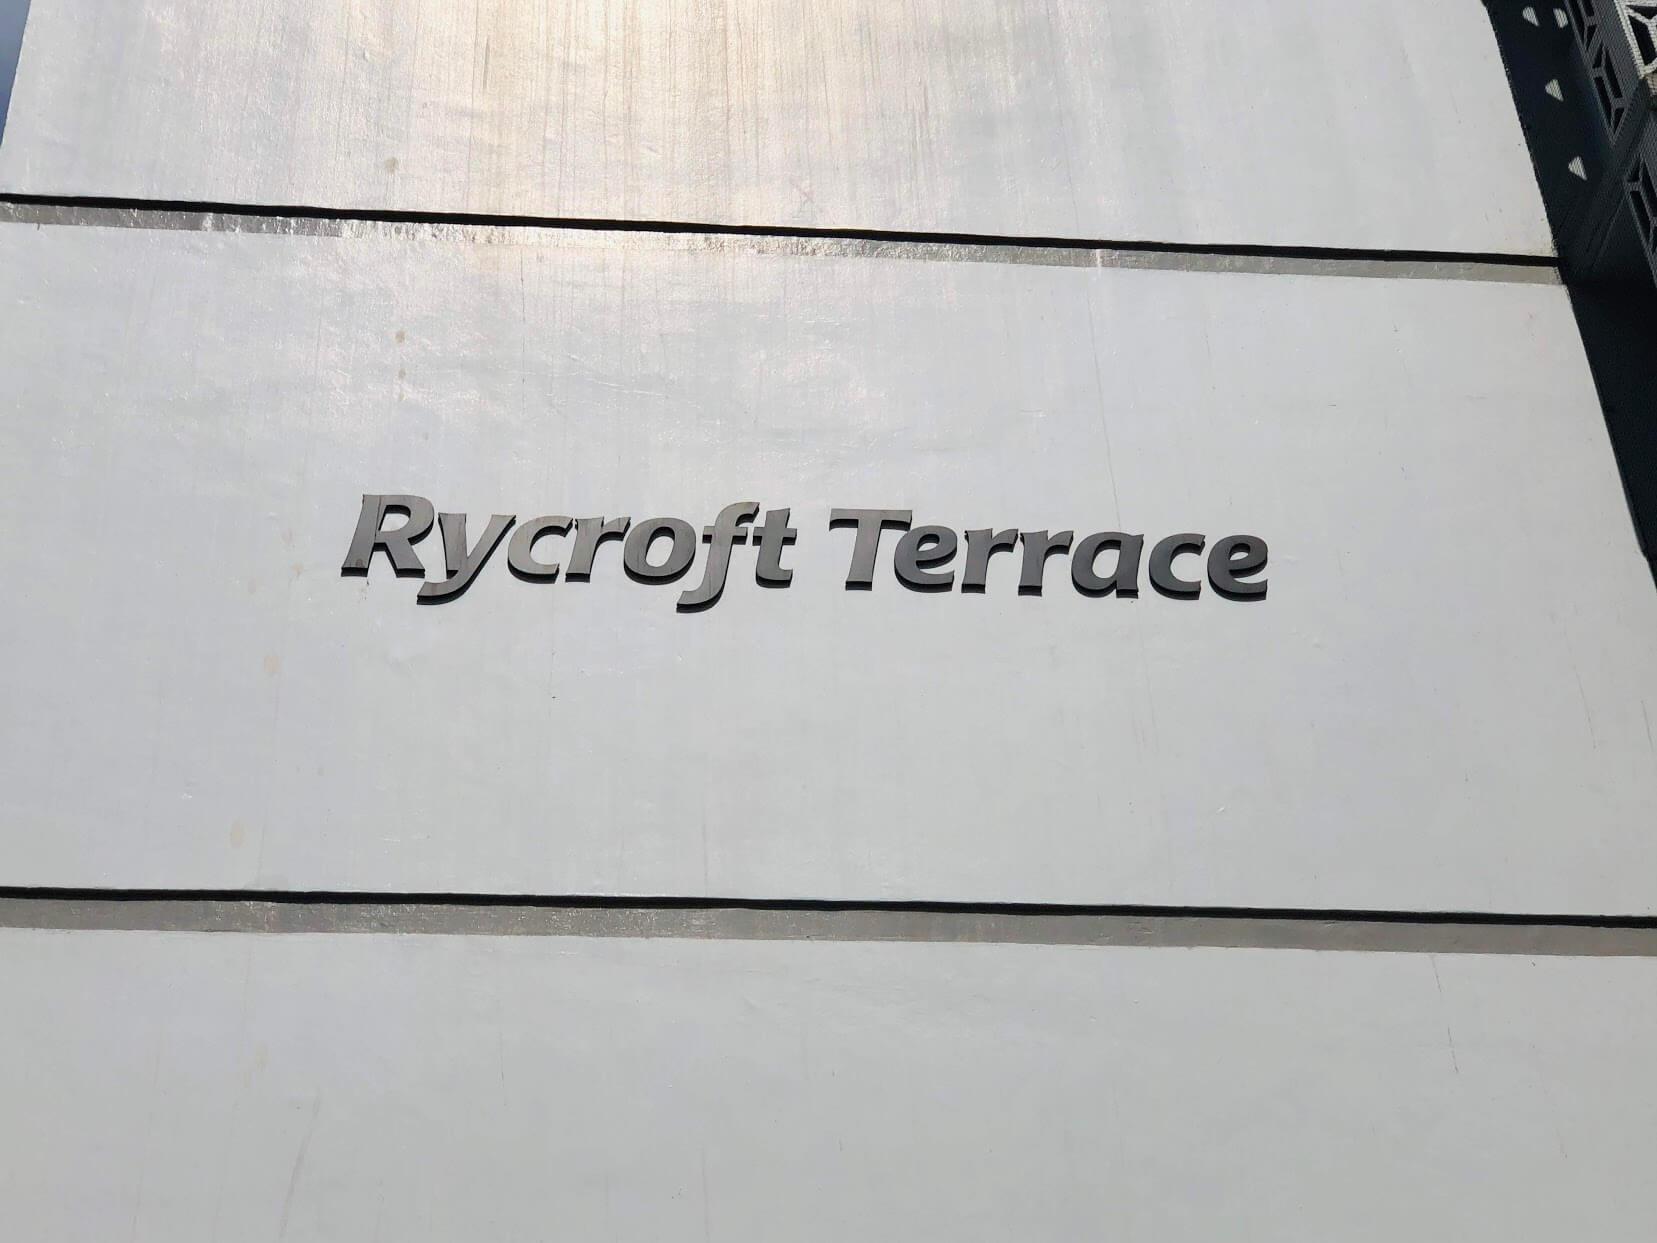 Rycroft Terraceの看板